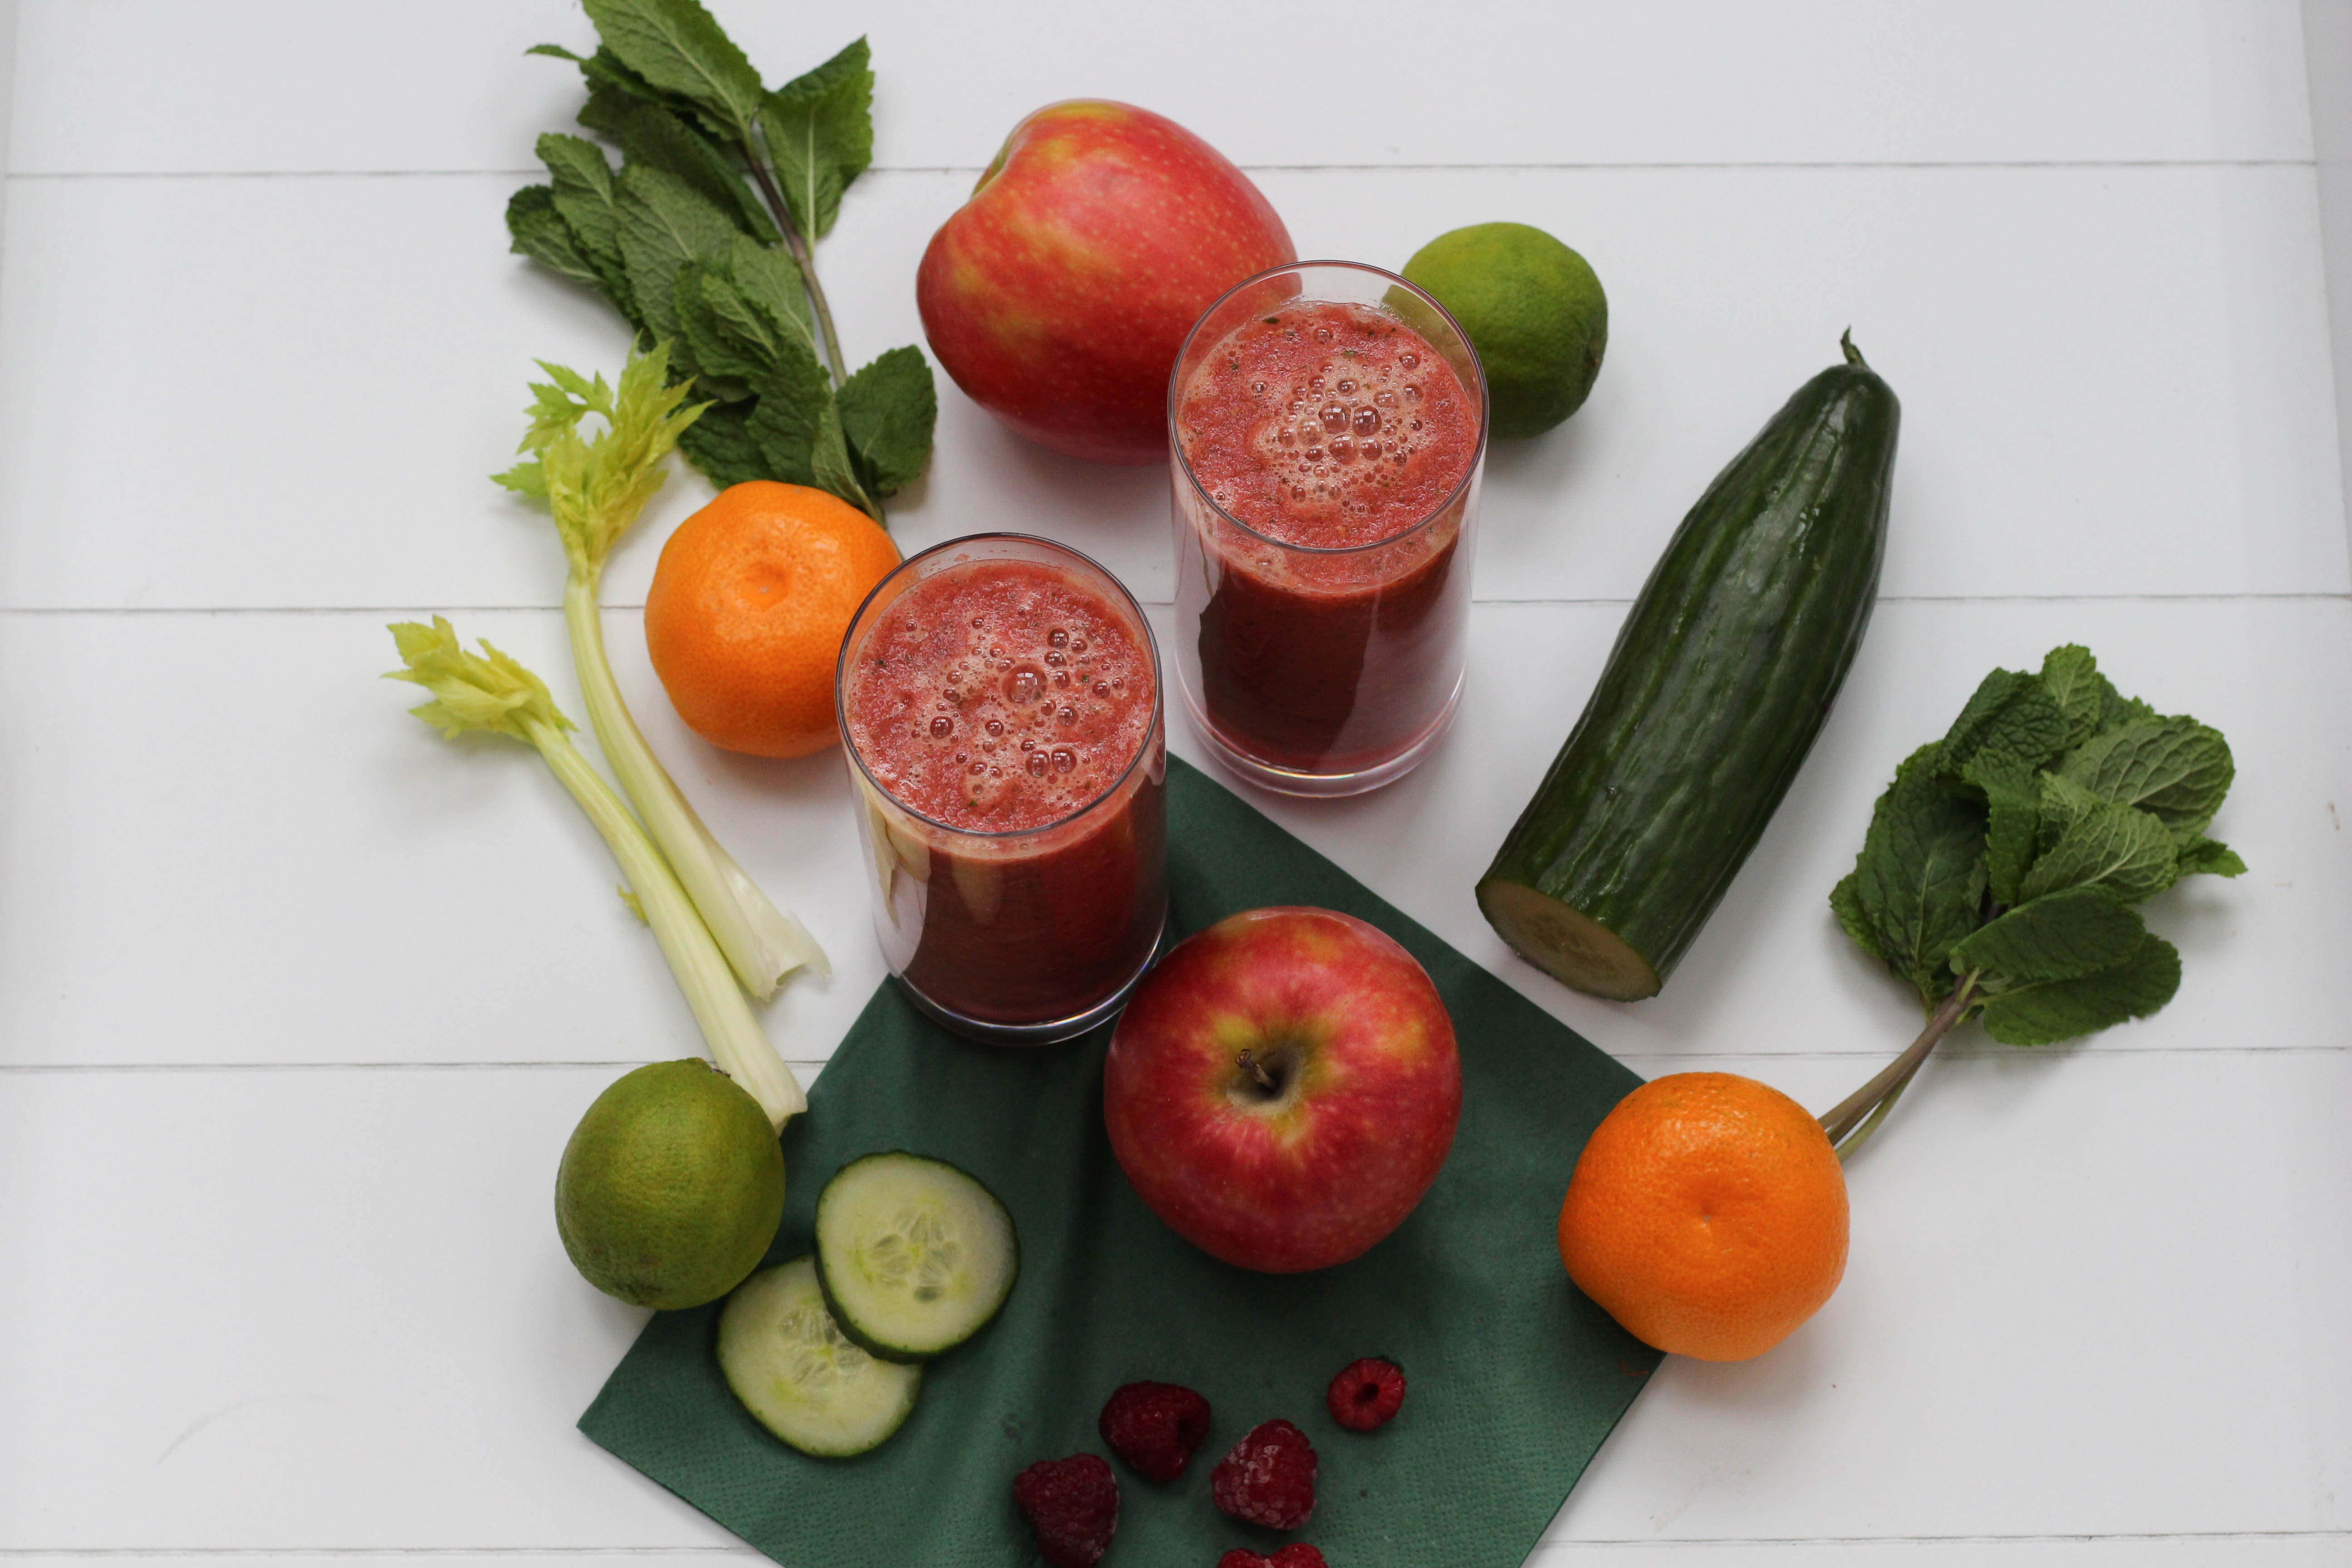 vegan-smoothie-hugo-minze-shake-gemuese-obst-superfood-homespa-plantbased